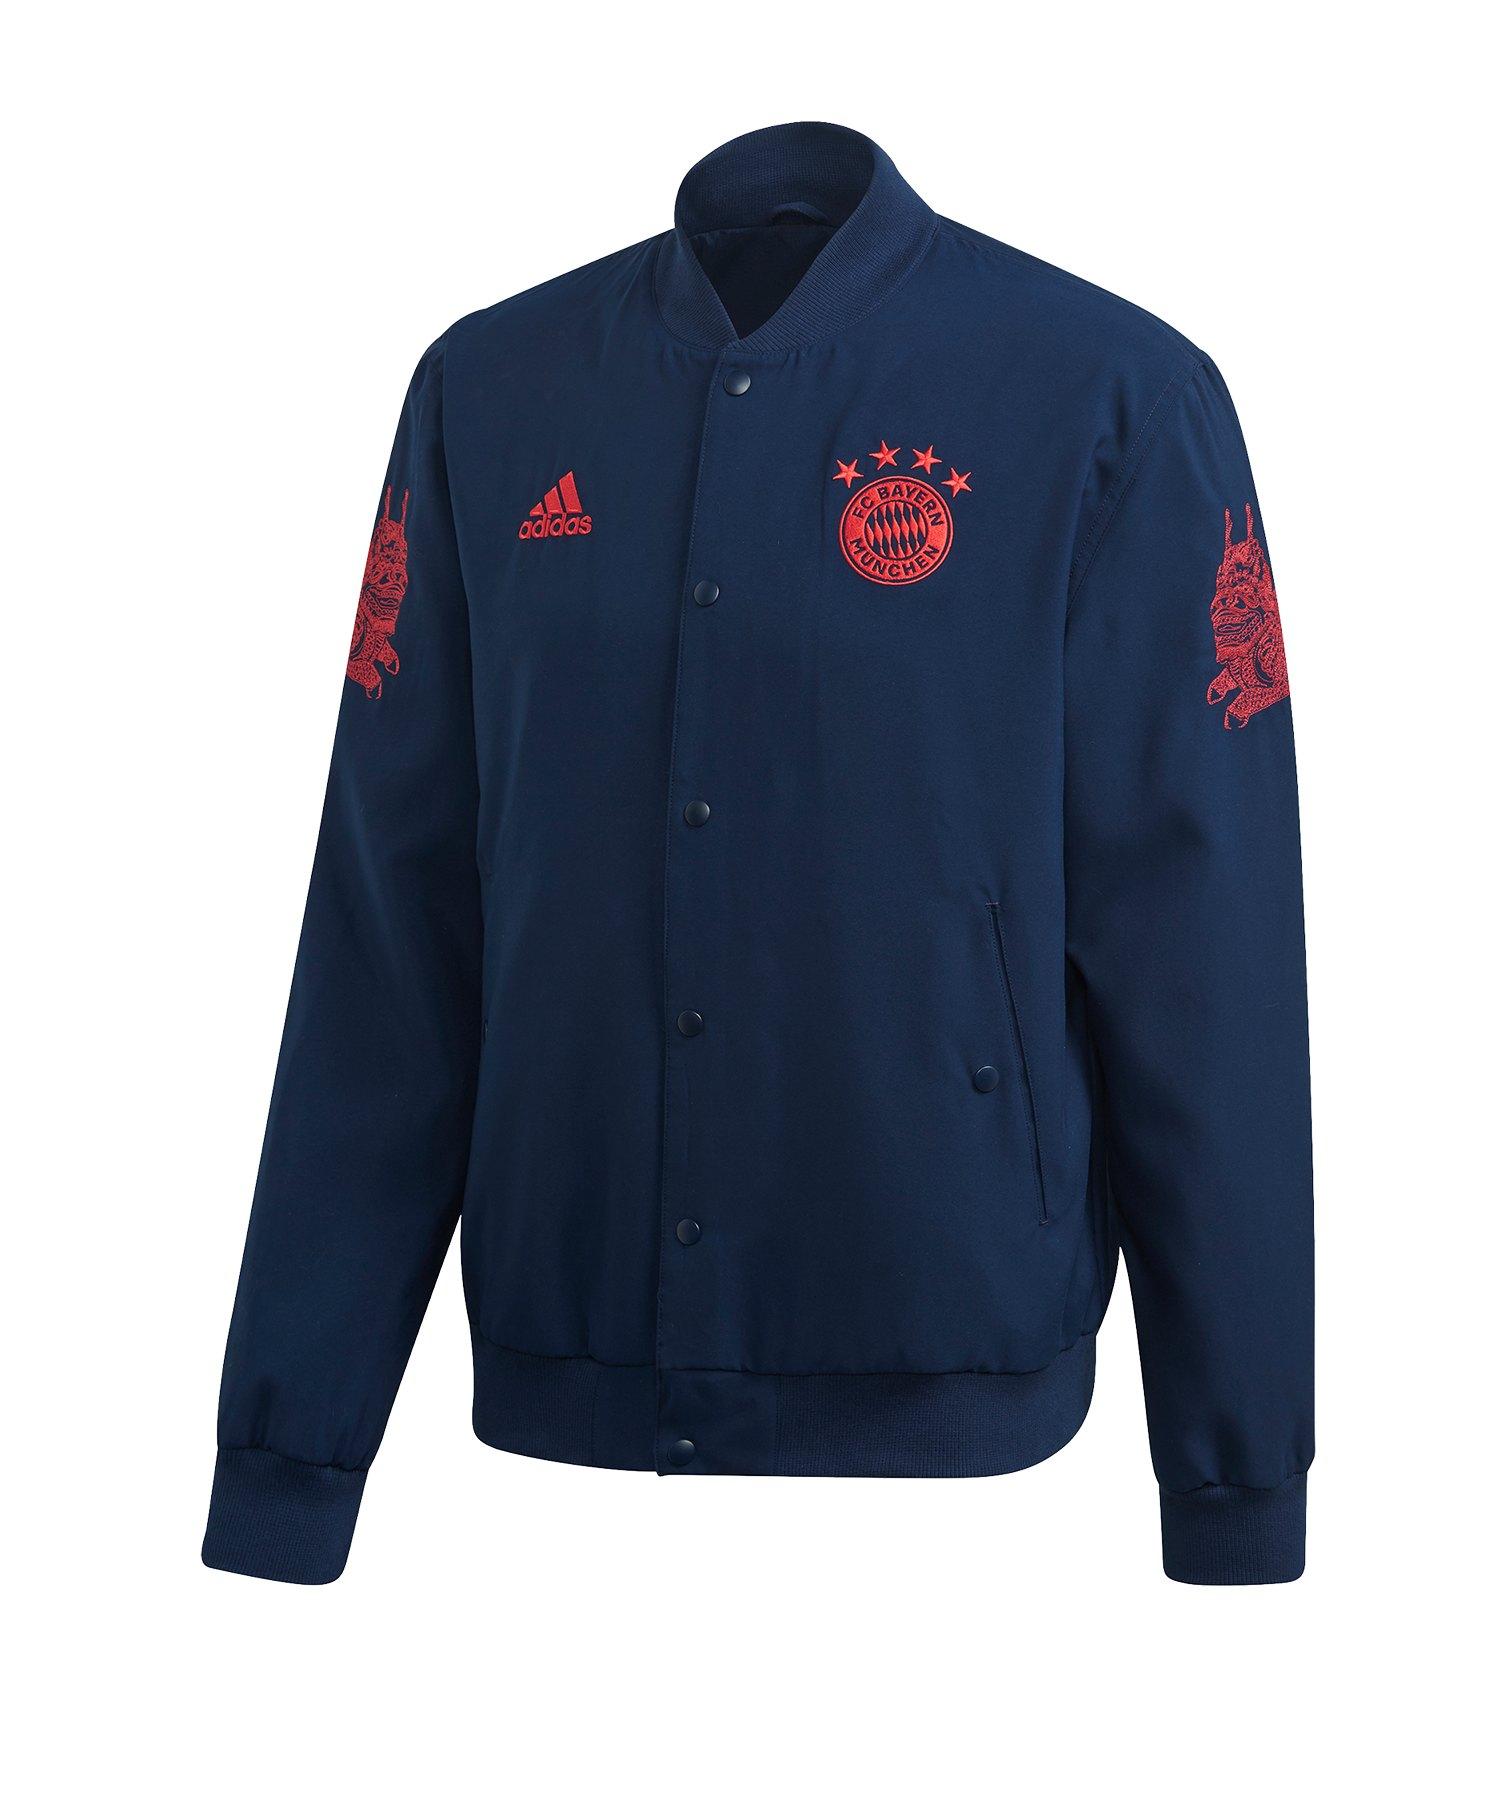 Jackets & Coats Official FC Bayern Munich Store